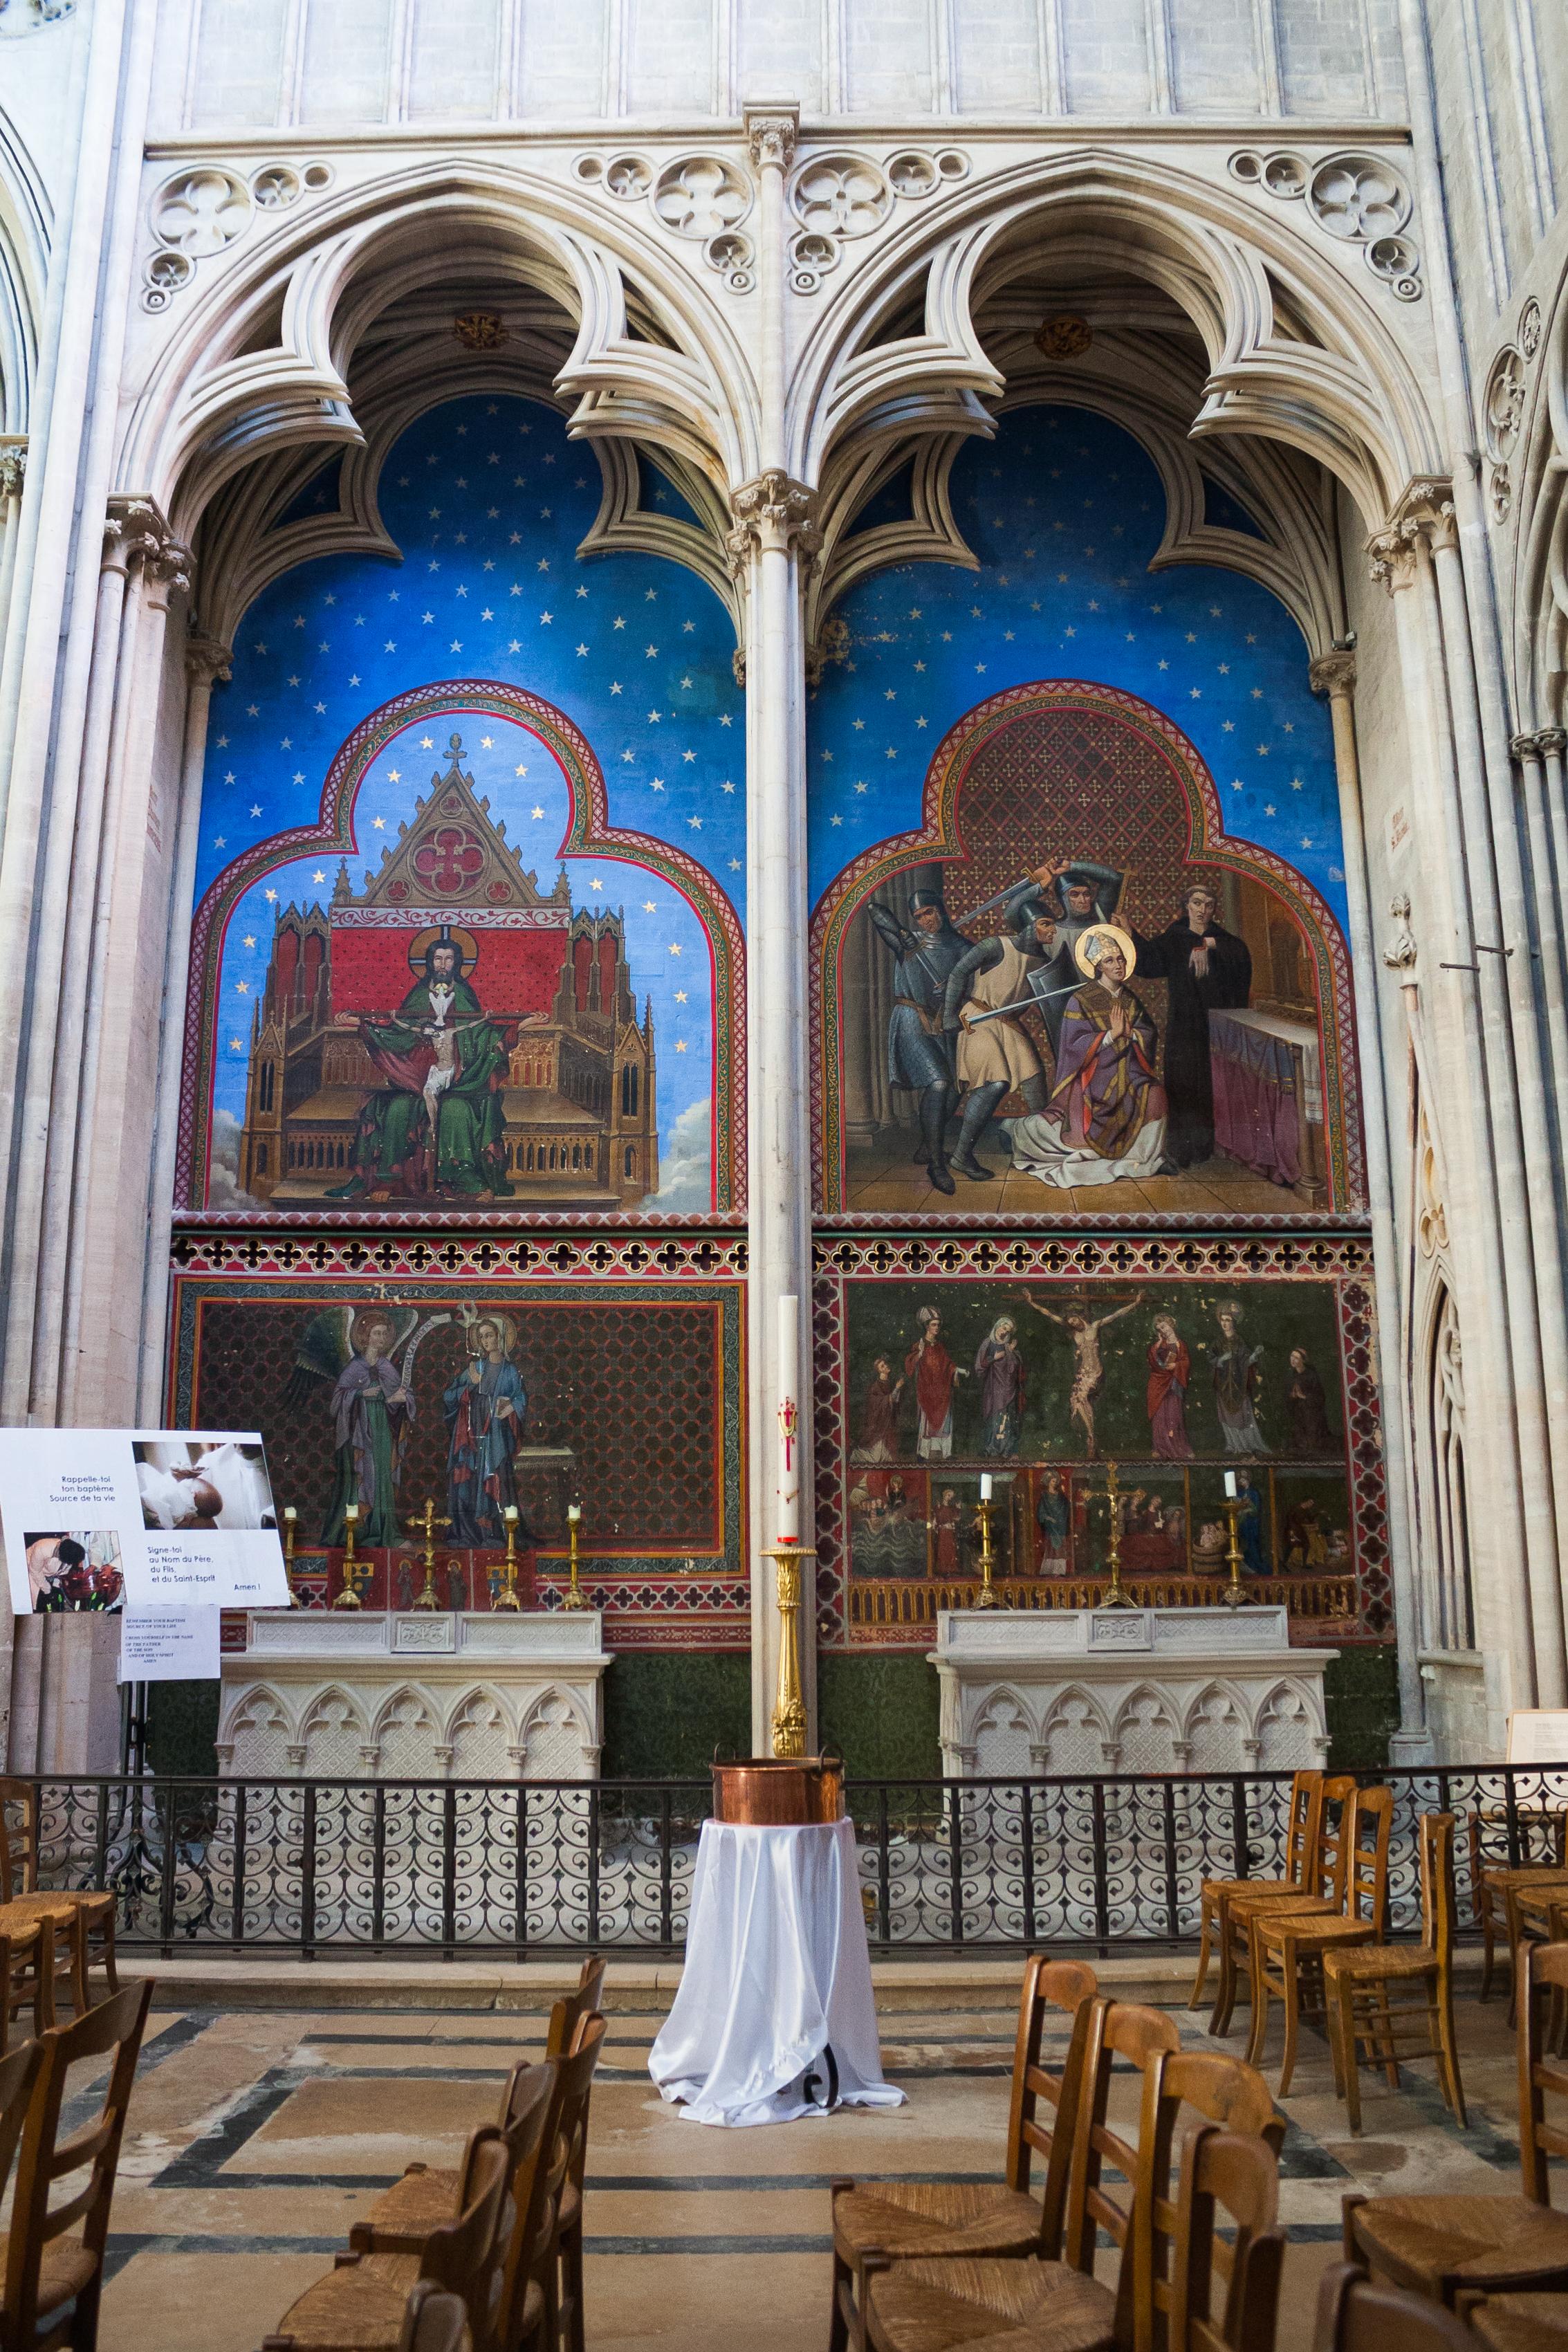 https://upload.wikimedia.org/wikipedia/commons/e/e5/Bayeux_Cath%C3%A9drale_Notre-Dame_Transept_du_sud_Peinture_murale_2016_08_22.jpg